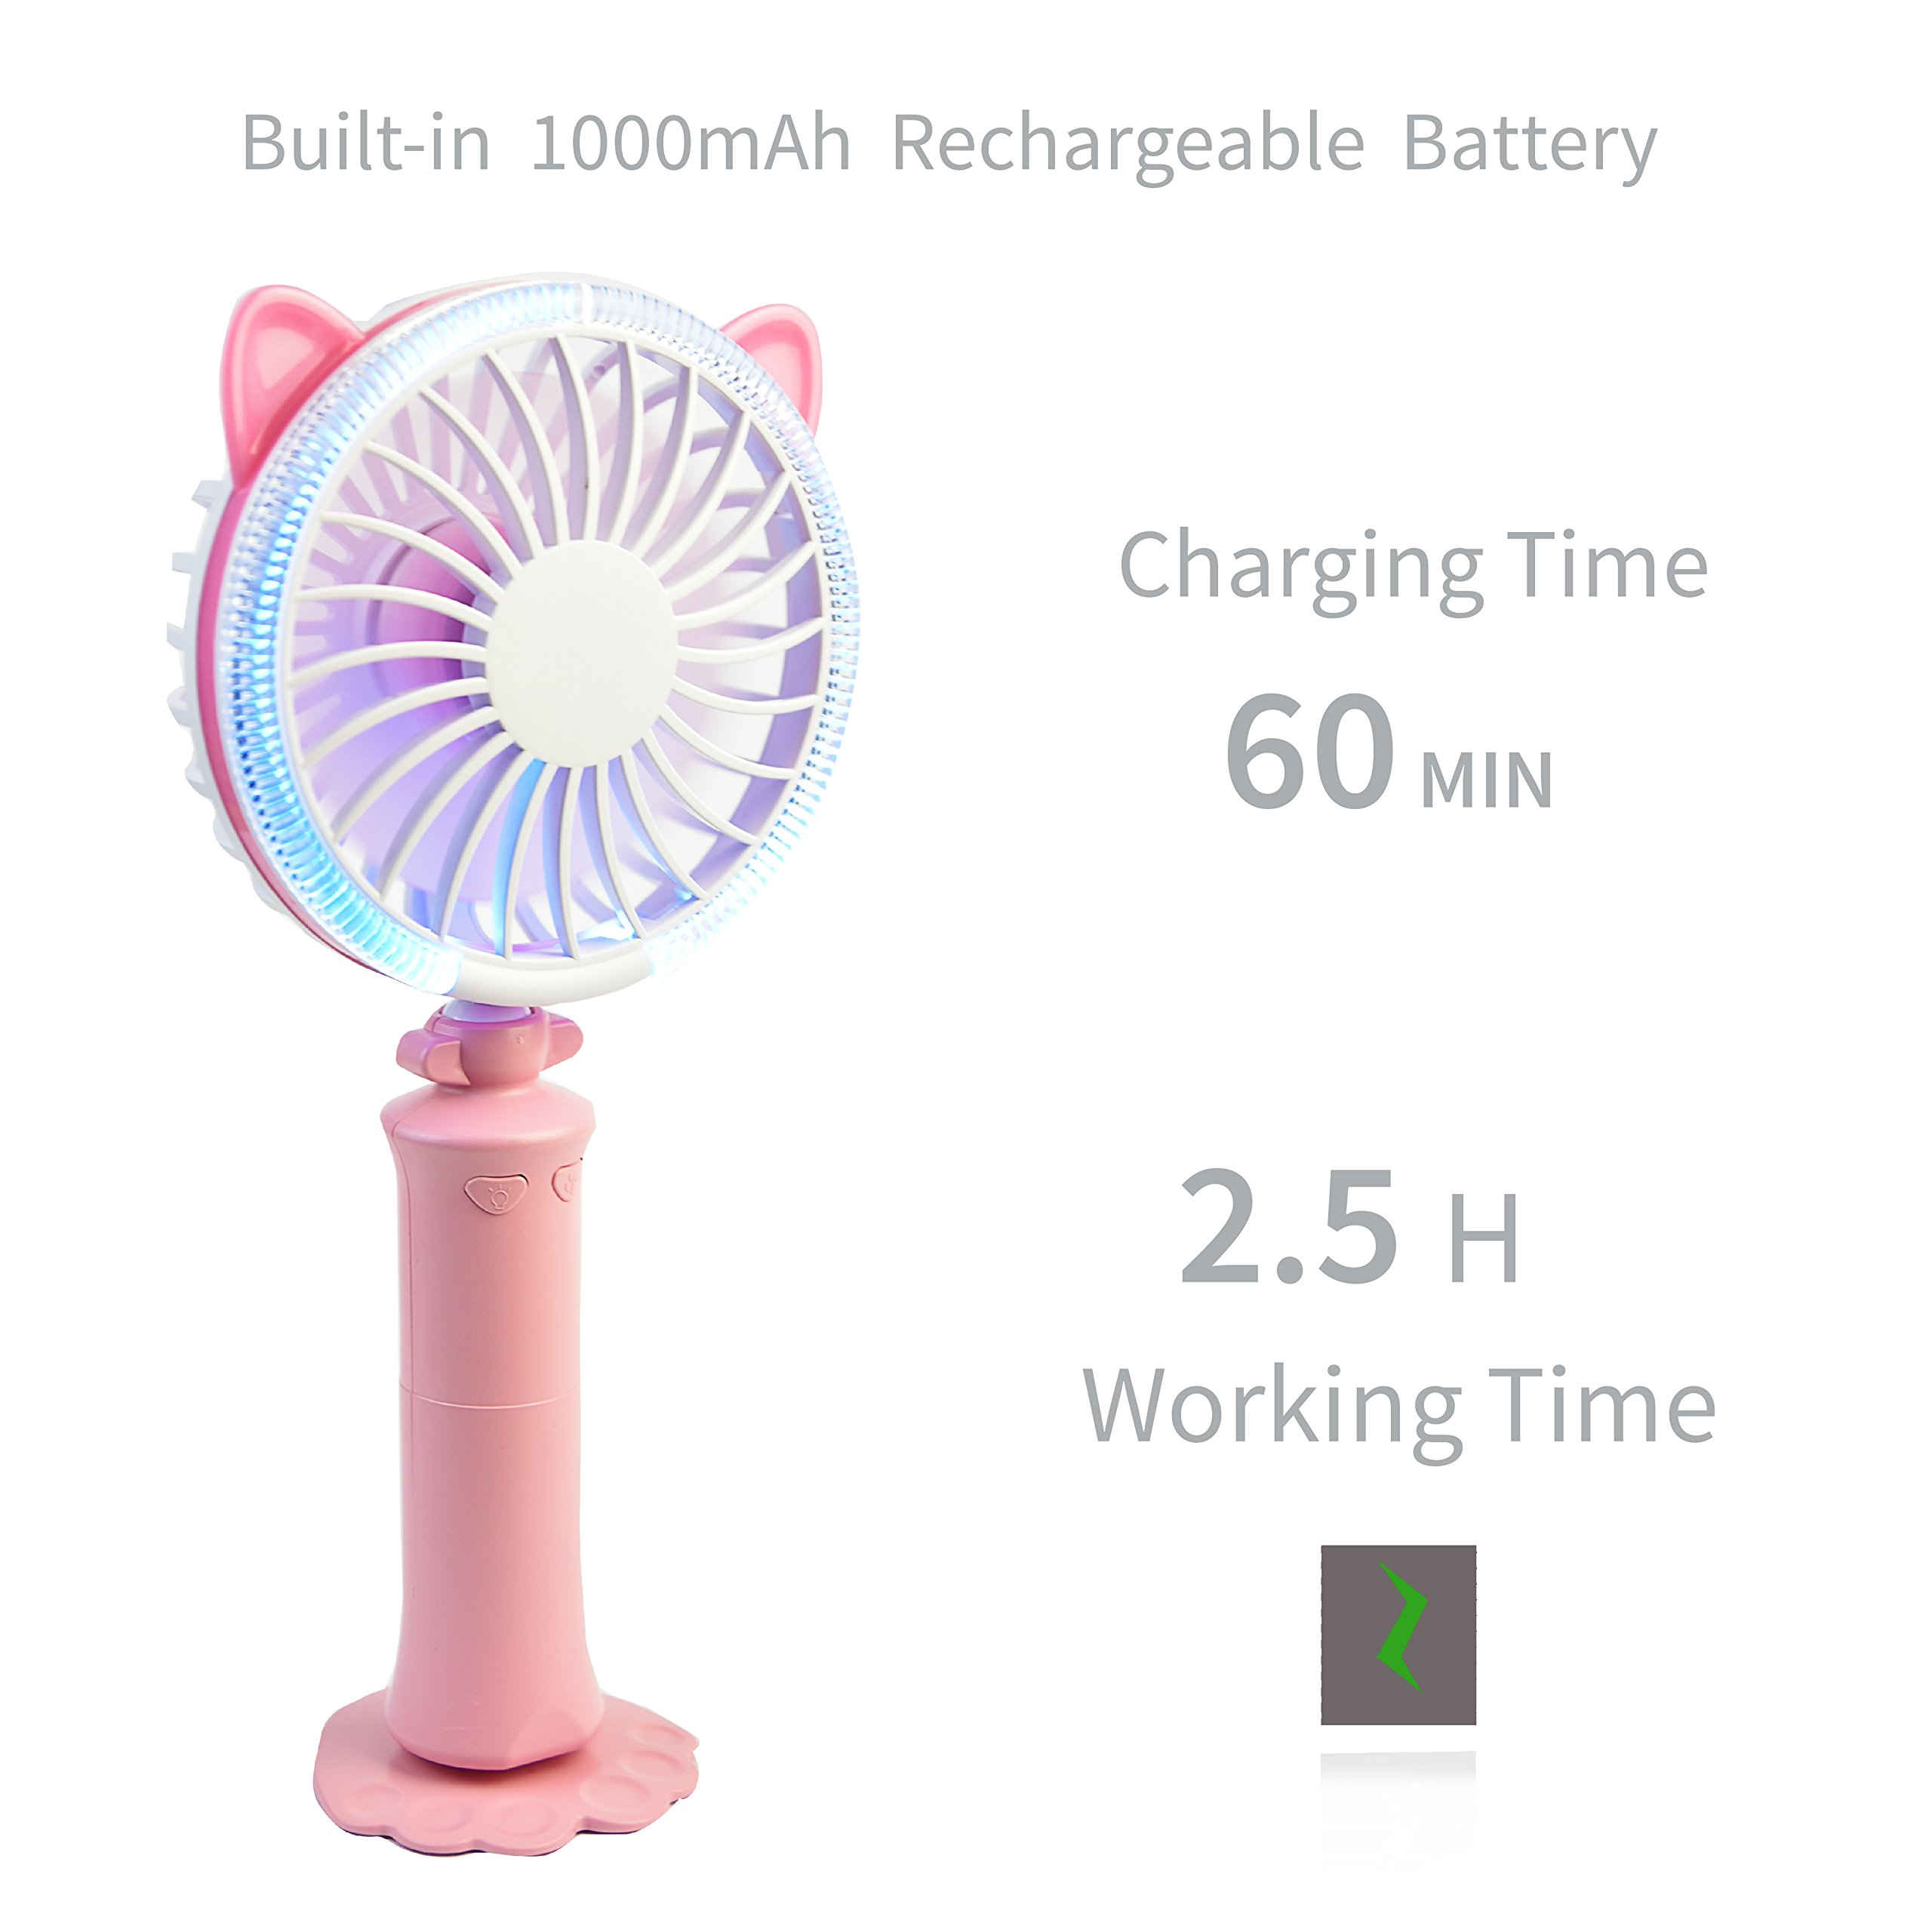 Tragbarer Mini Ventilator mit Batterie Mobil Leise Handventilator,mit LED Mehrfarbige Änderungen, USB aufladbare akku (rosa)